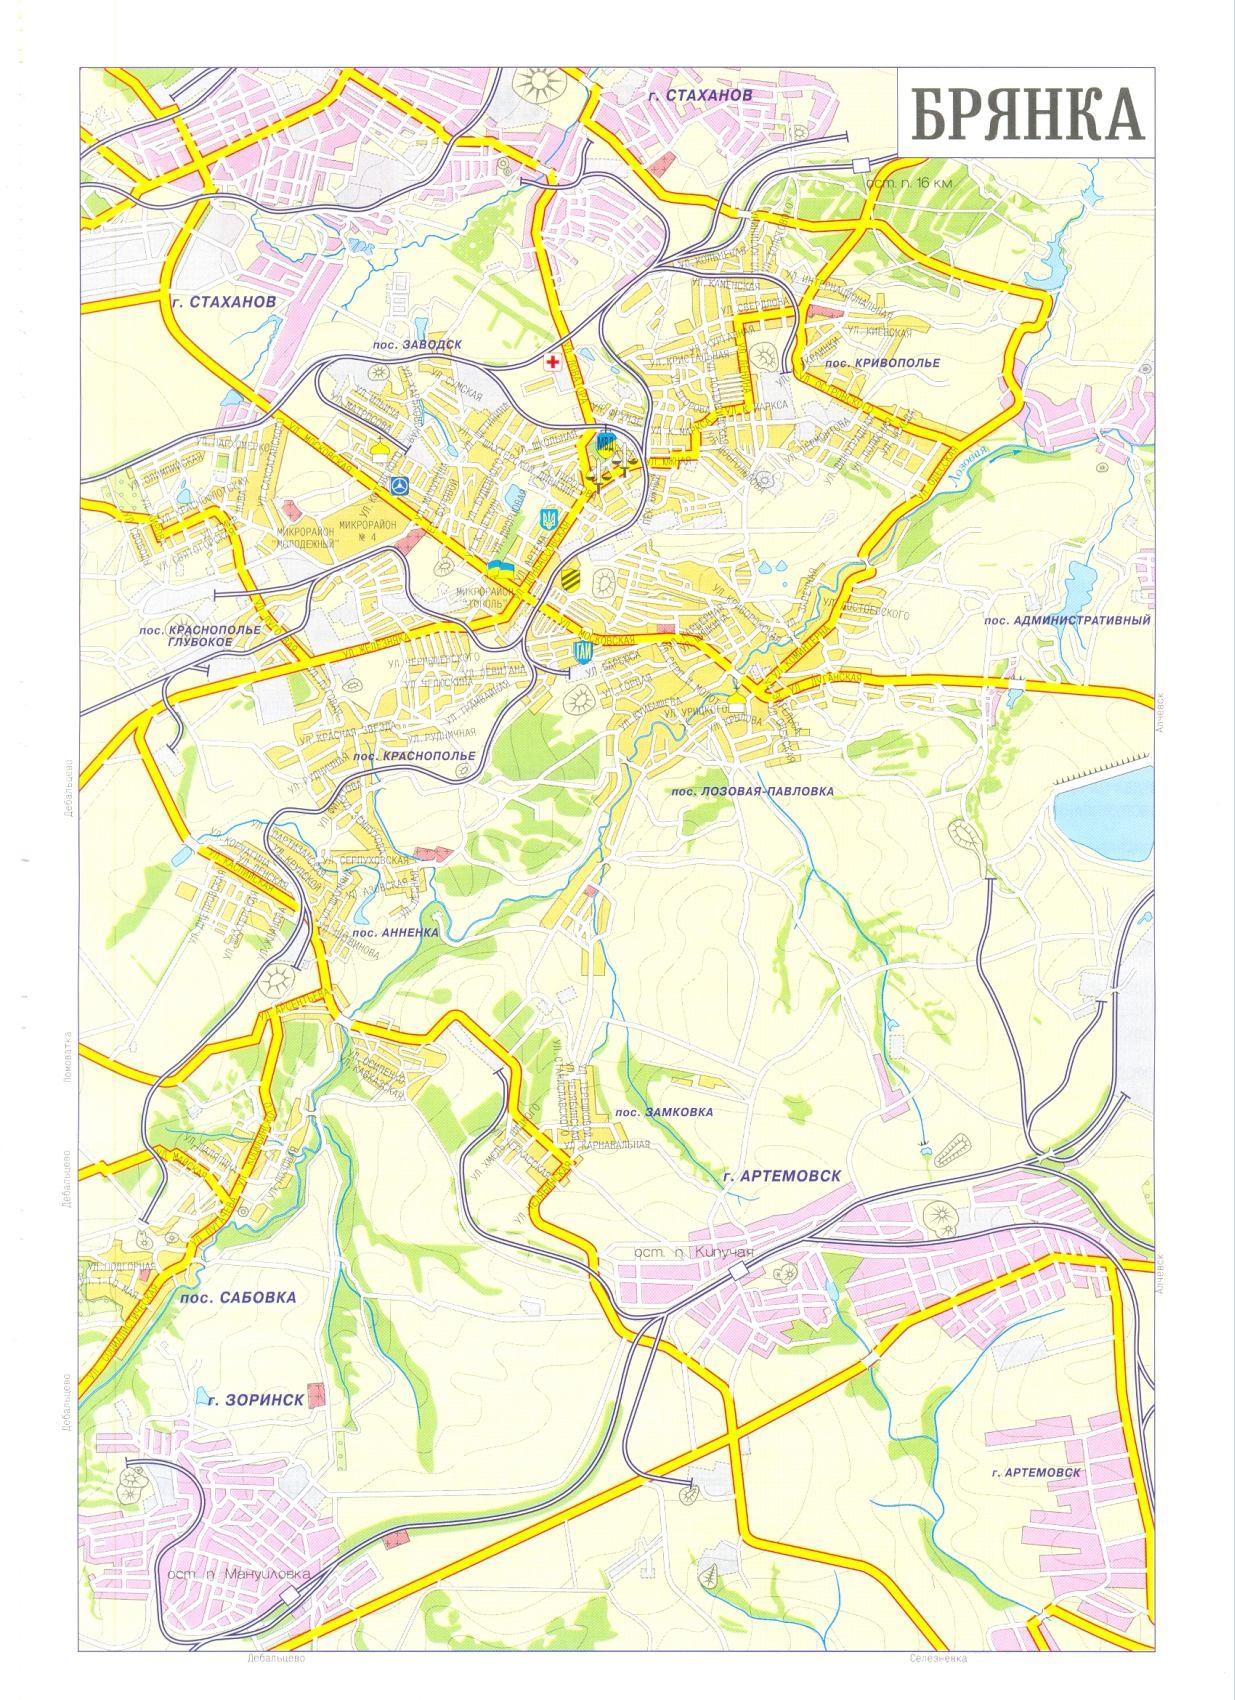 Карта города Брянка